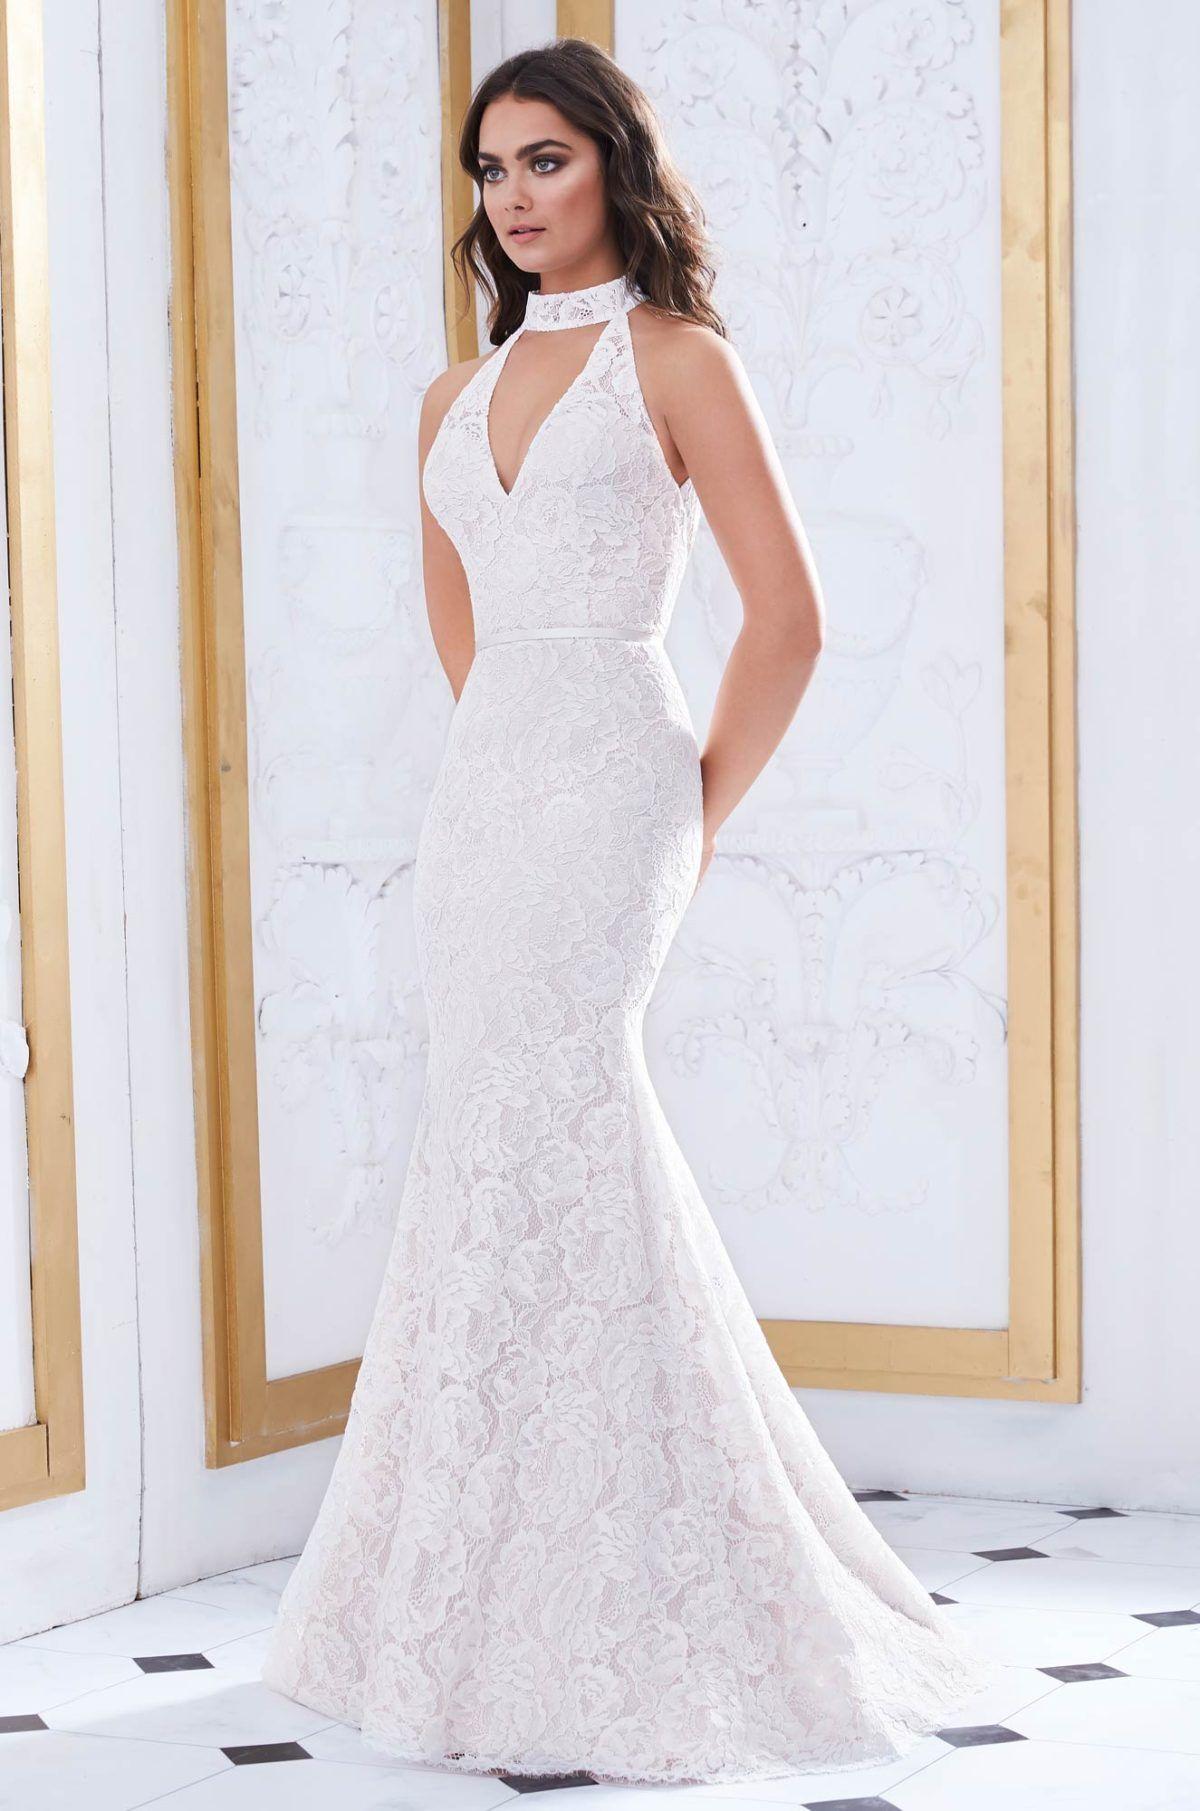 Collared Neckline Wedding Dress Style 4868 Paloma